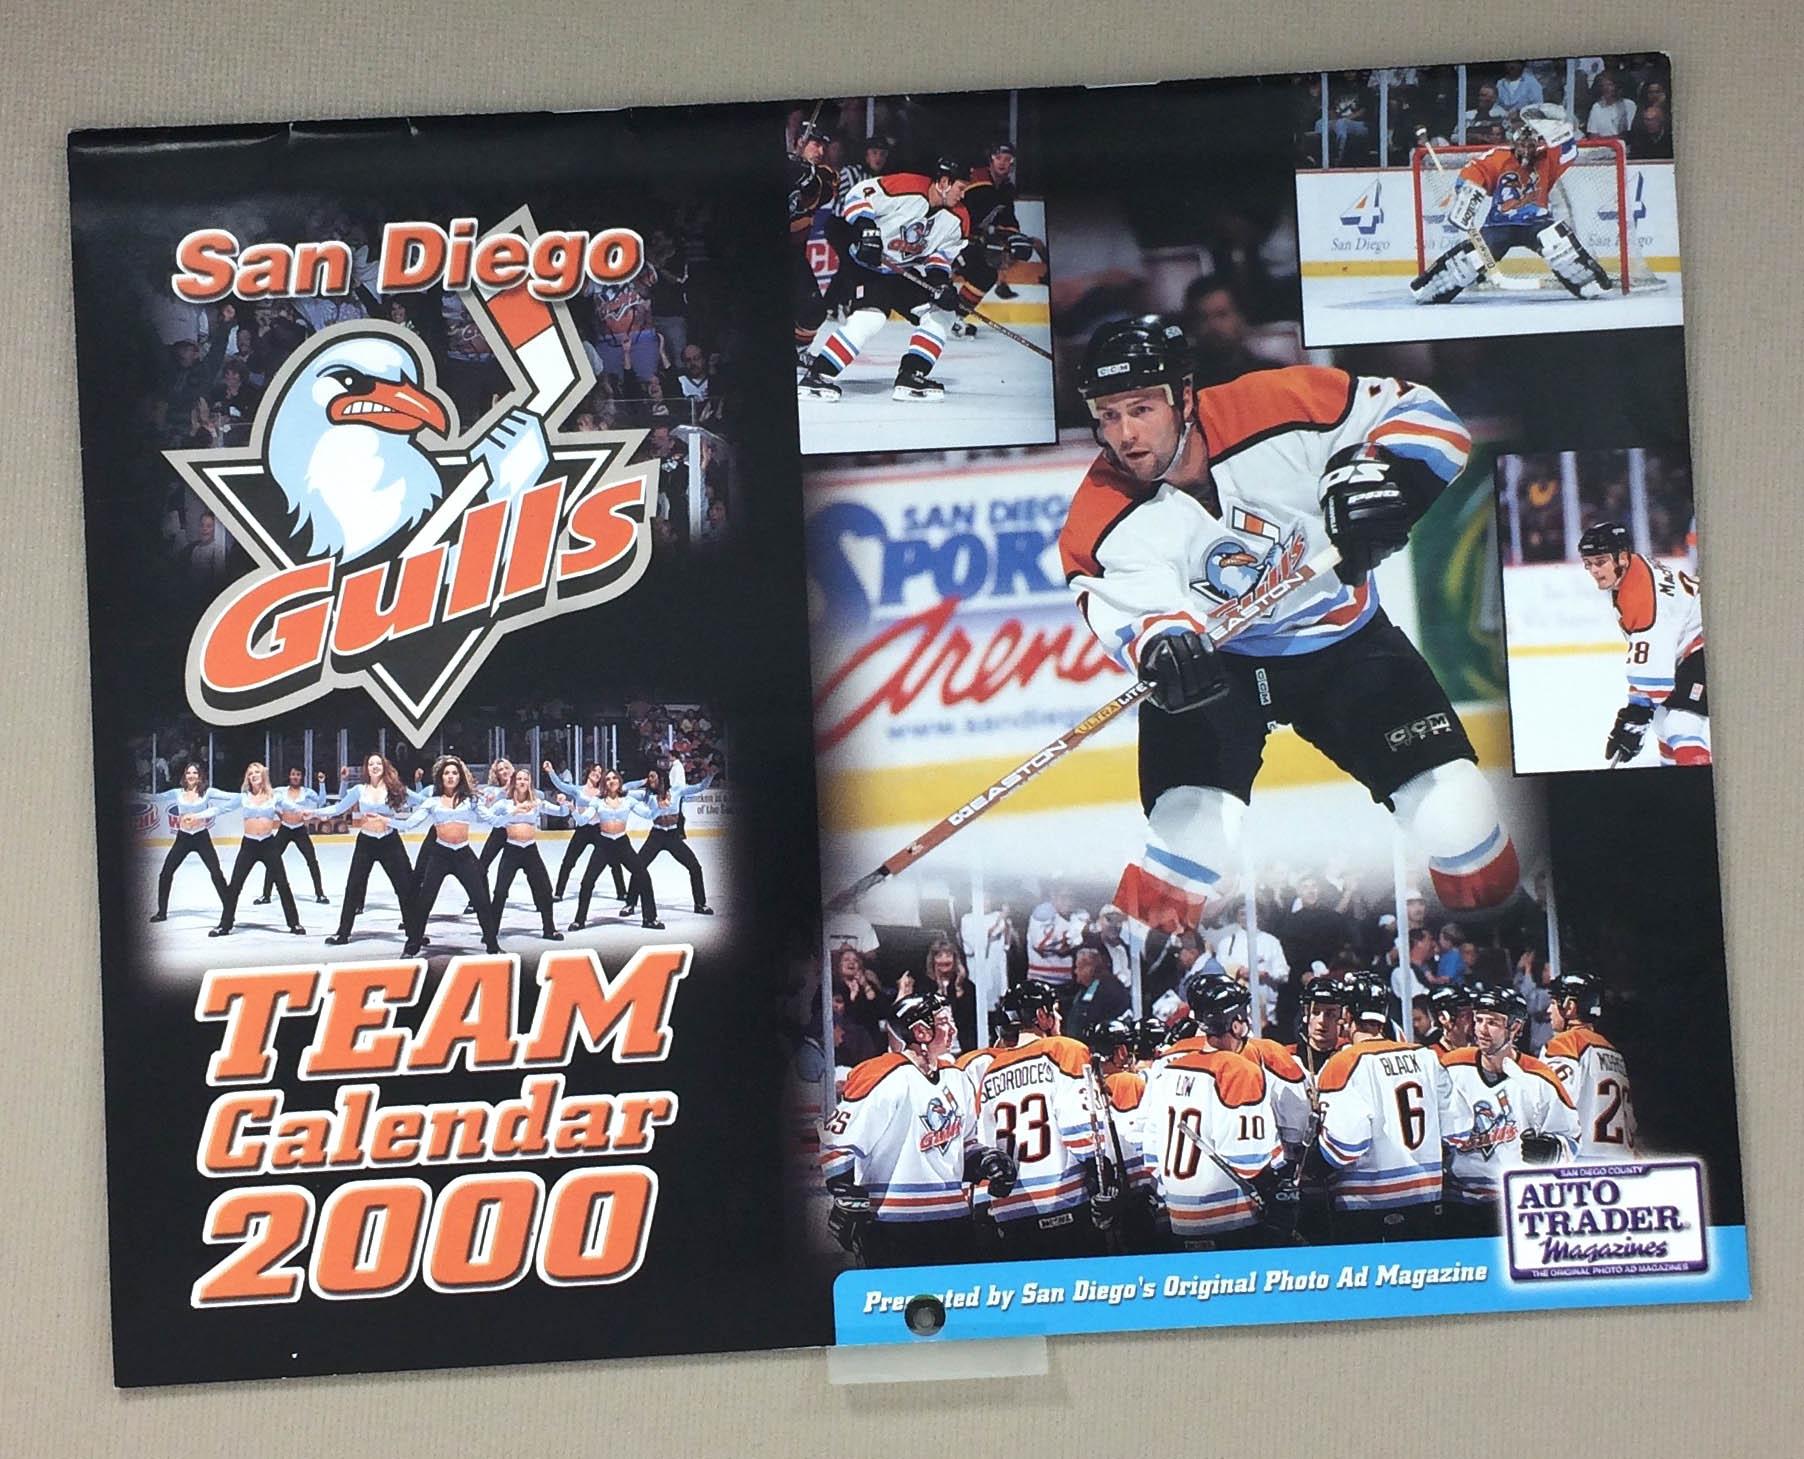 San Diego Gulls 2000 Team Calendar